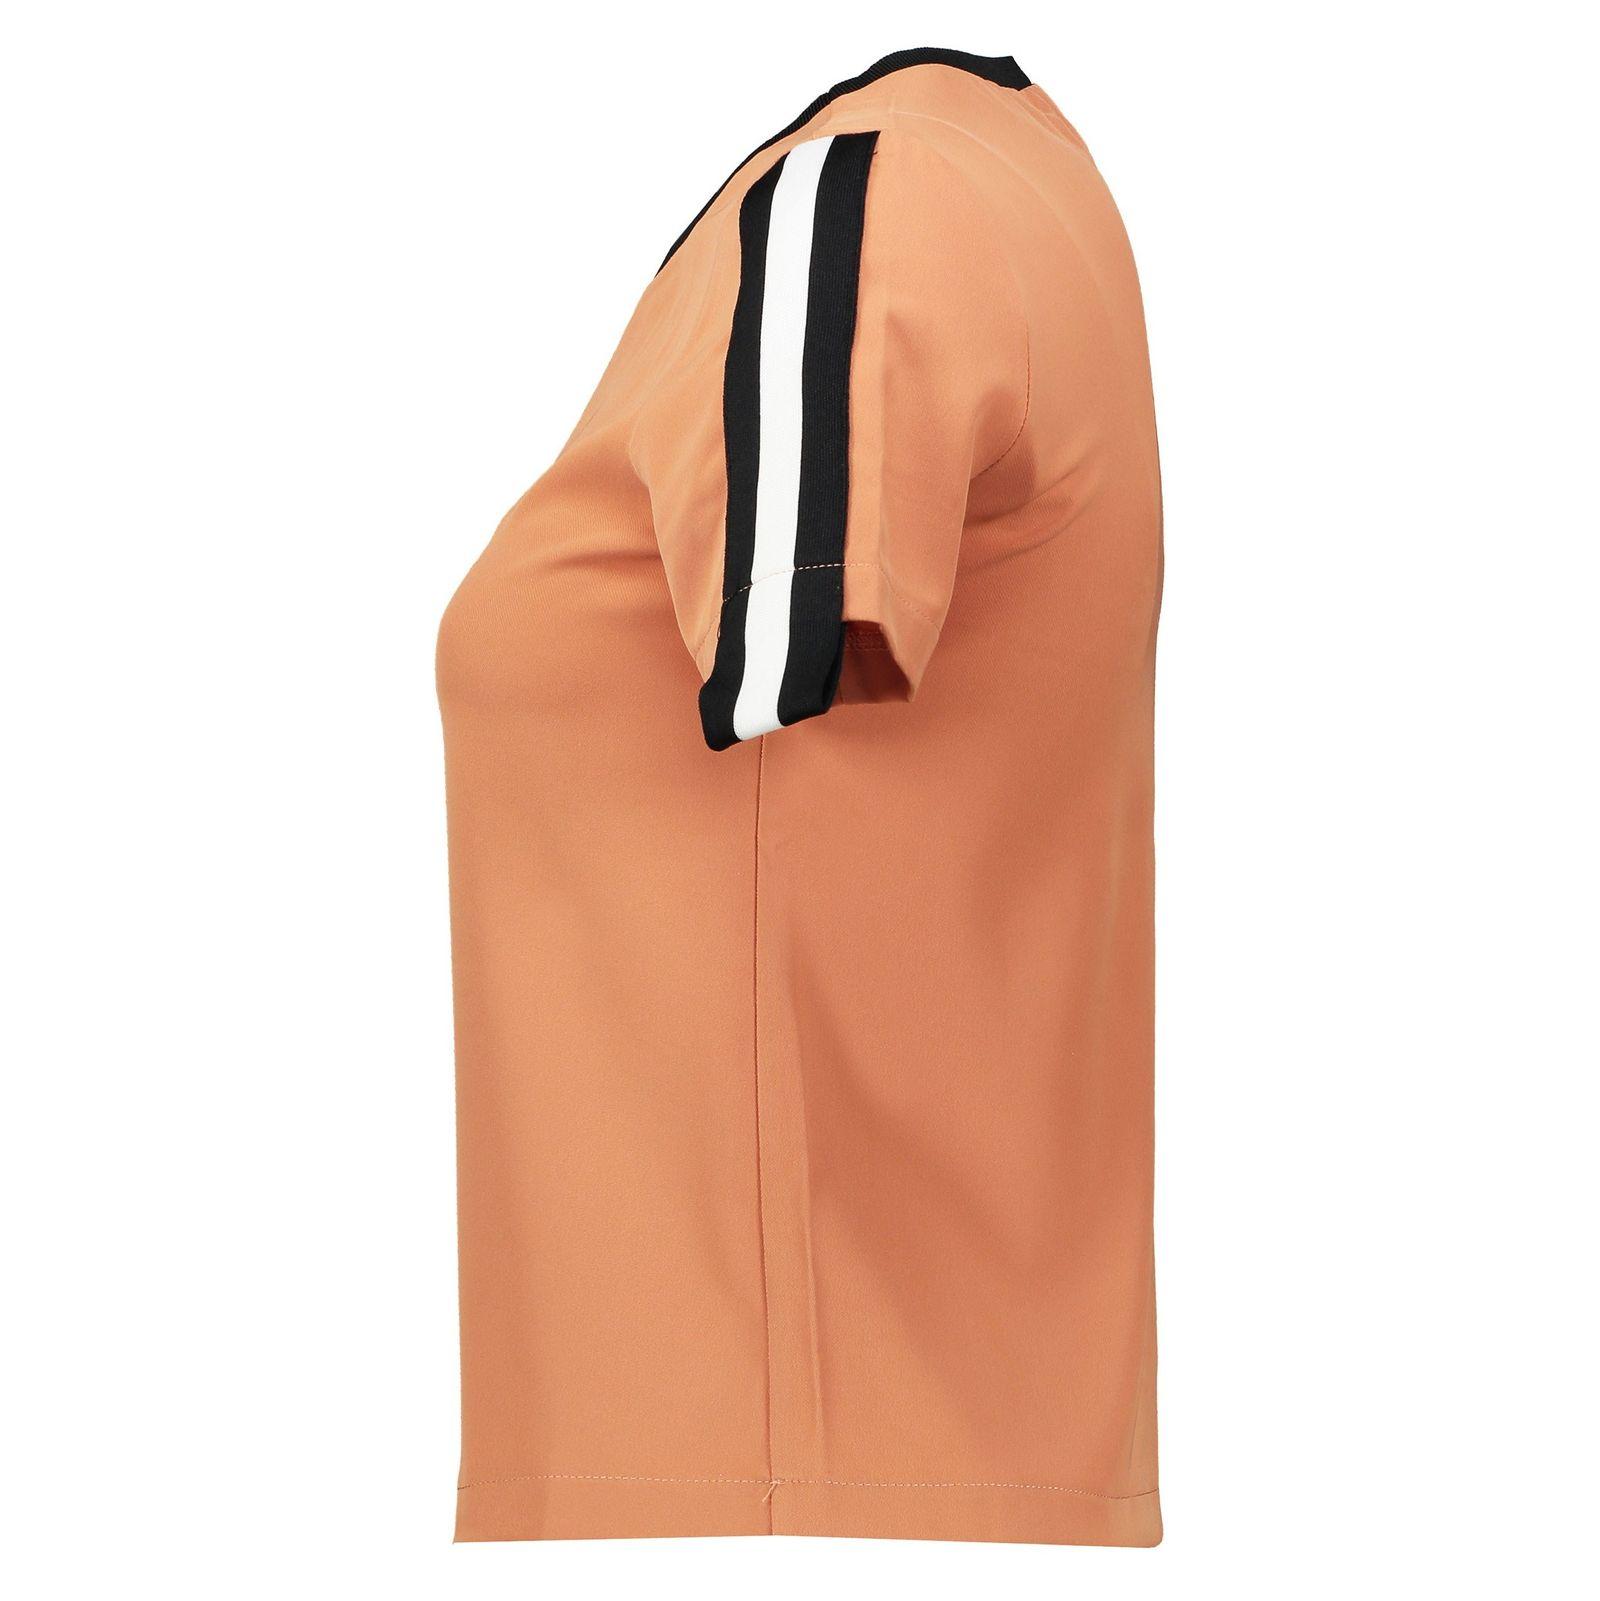 تی شرت یقه گرد زنانه - امپریال - نارنجي تيره - 5